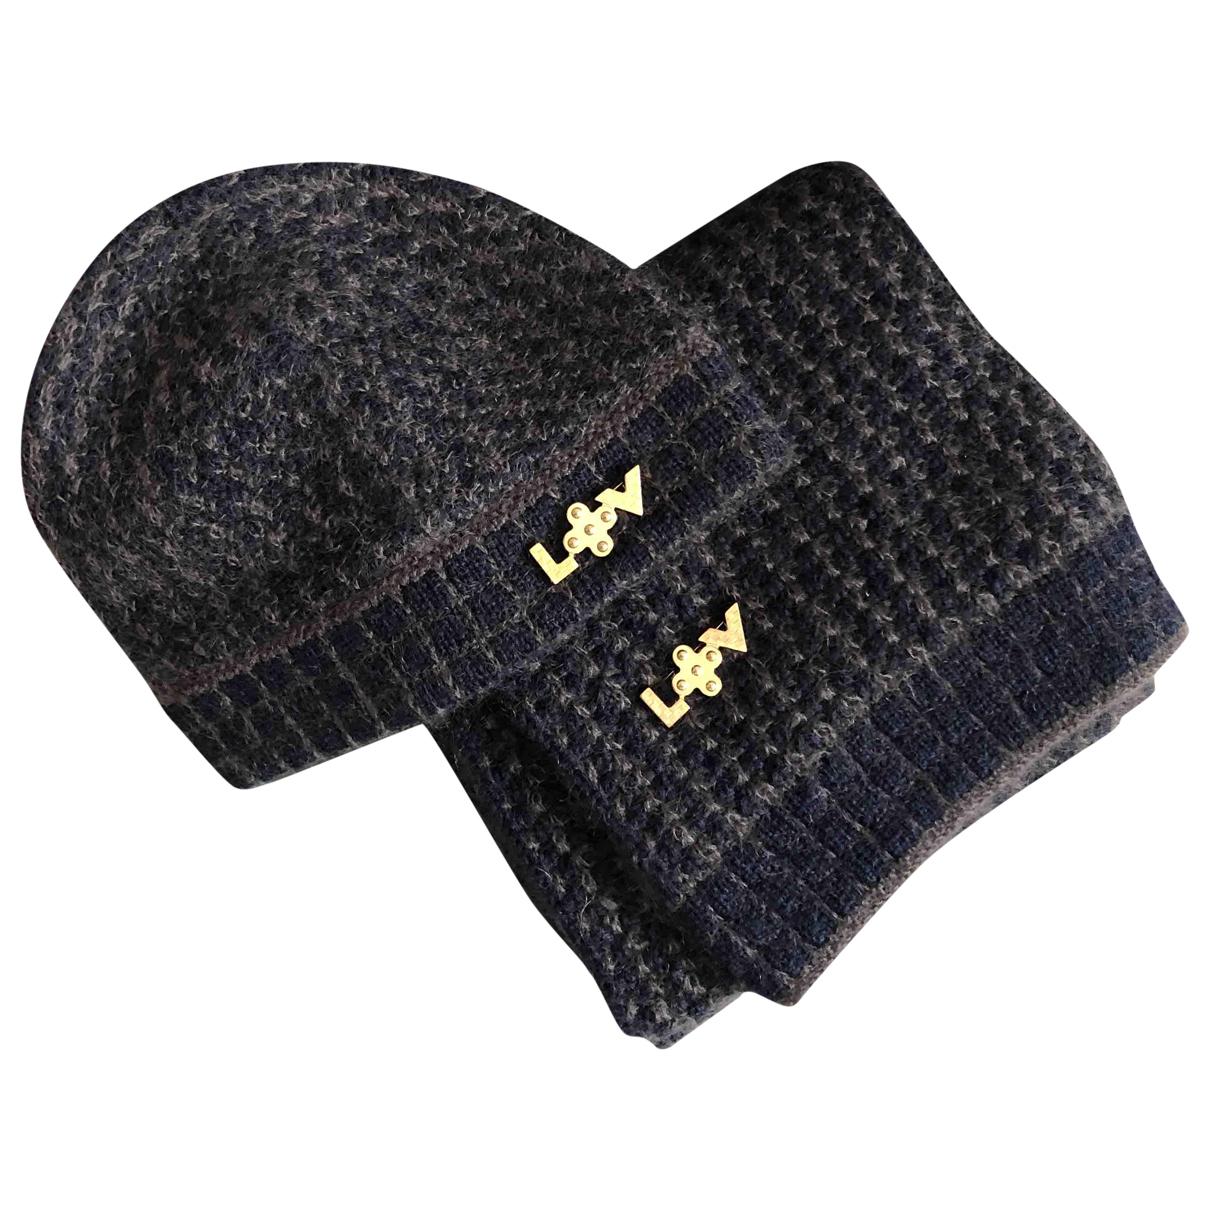 Louis Vuitton \N Multicolour Wool hat for Women M